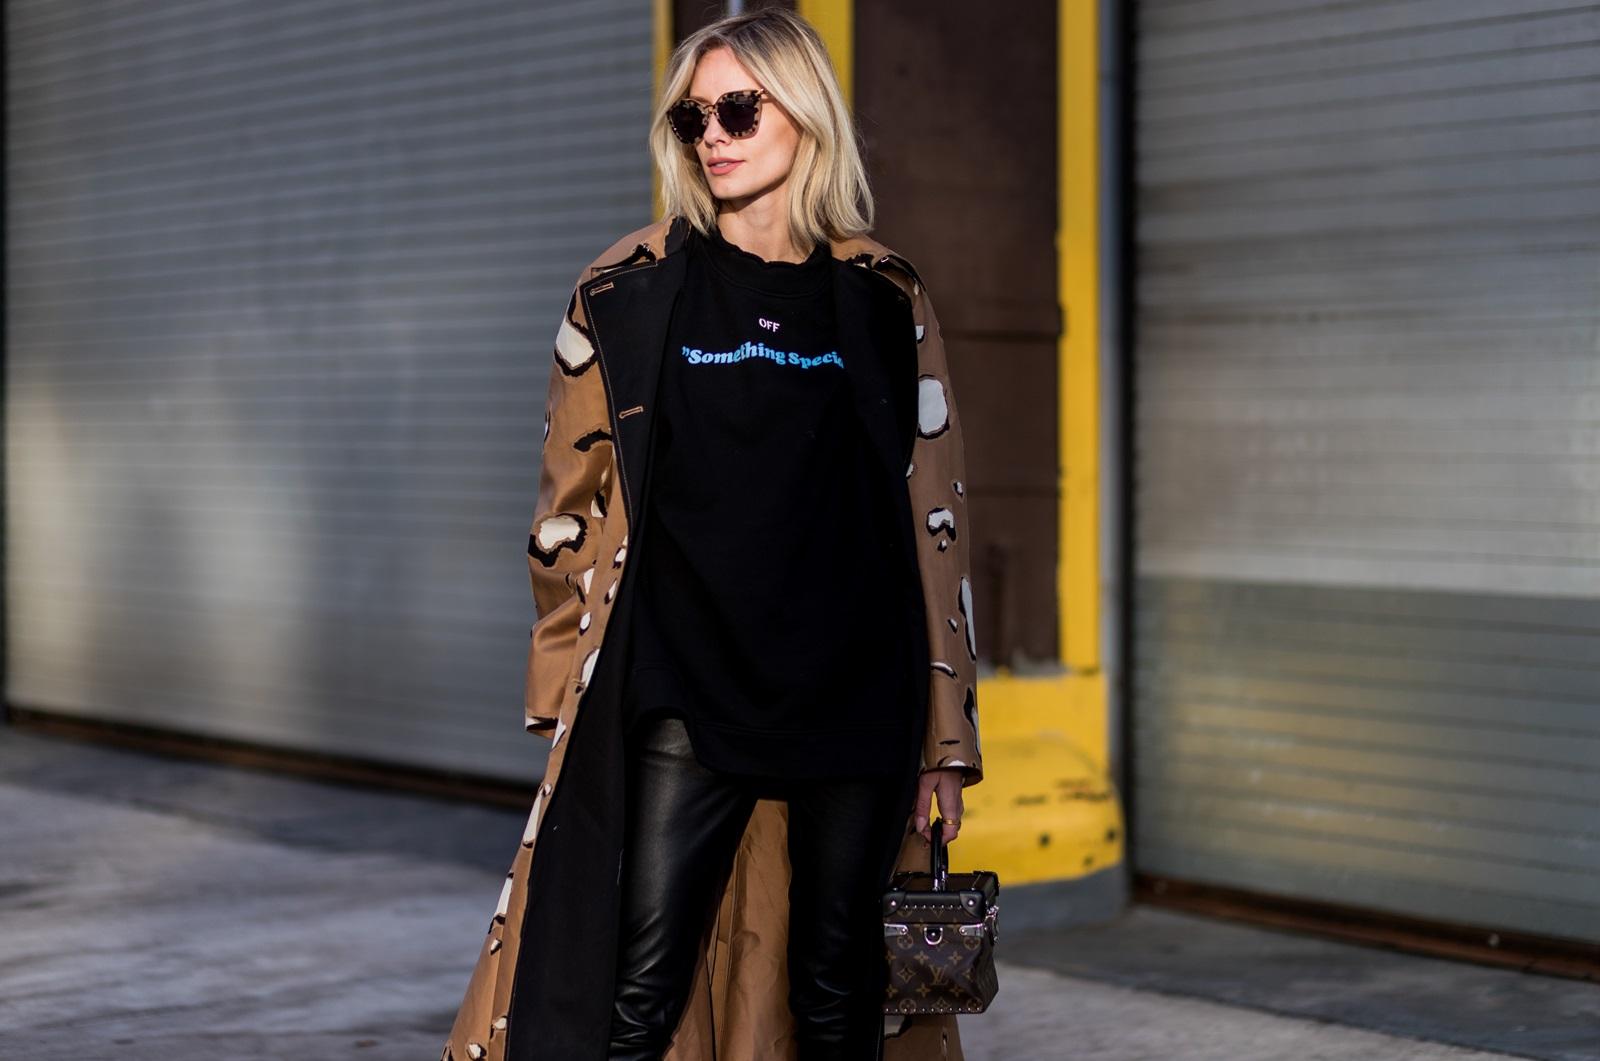 lisa-rvd-fashionblogger-sportmax-2